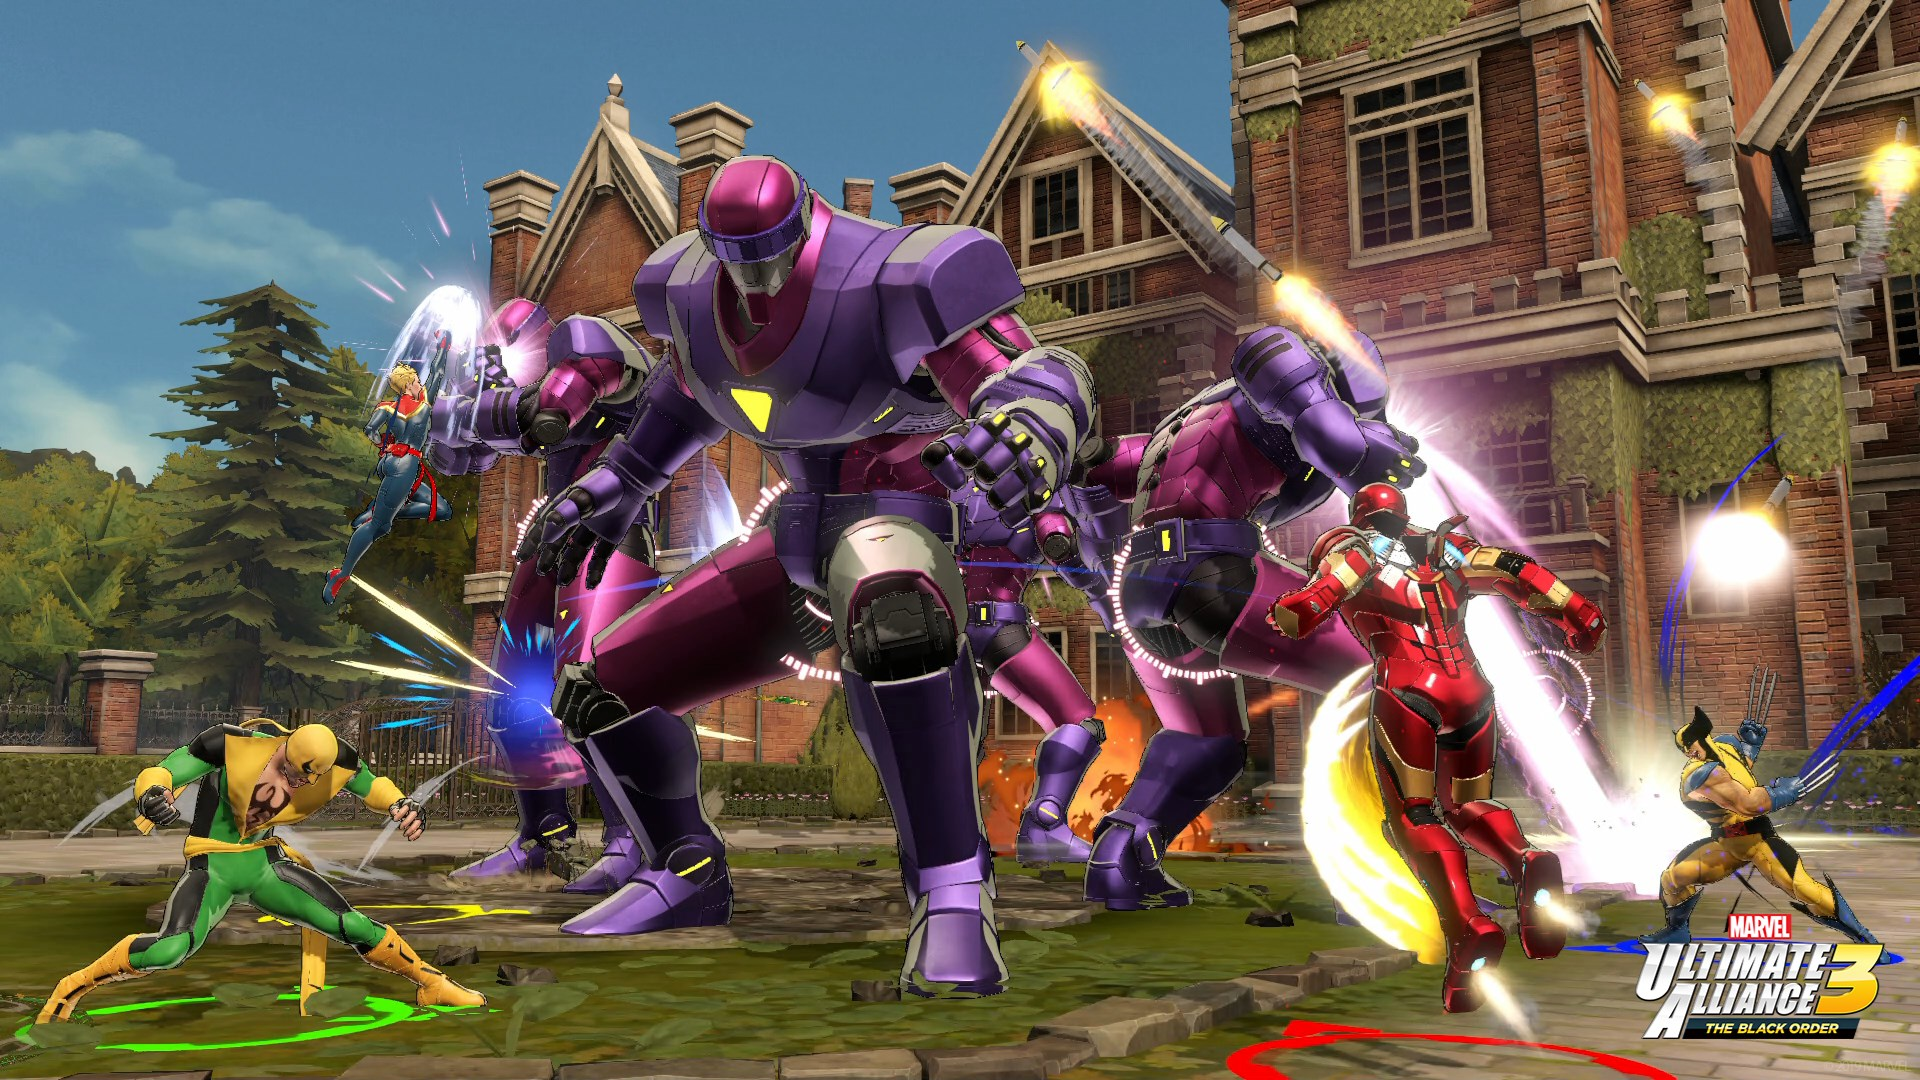 Marvel Ultimate Alliance 3 The Black Order Releases